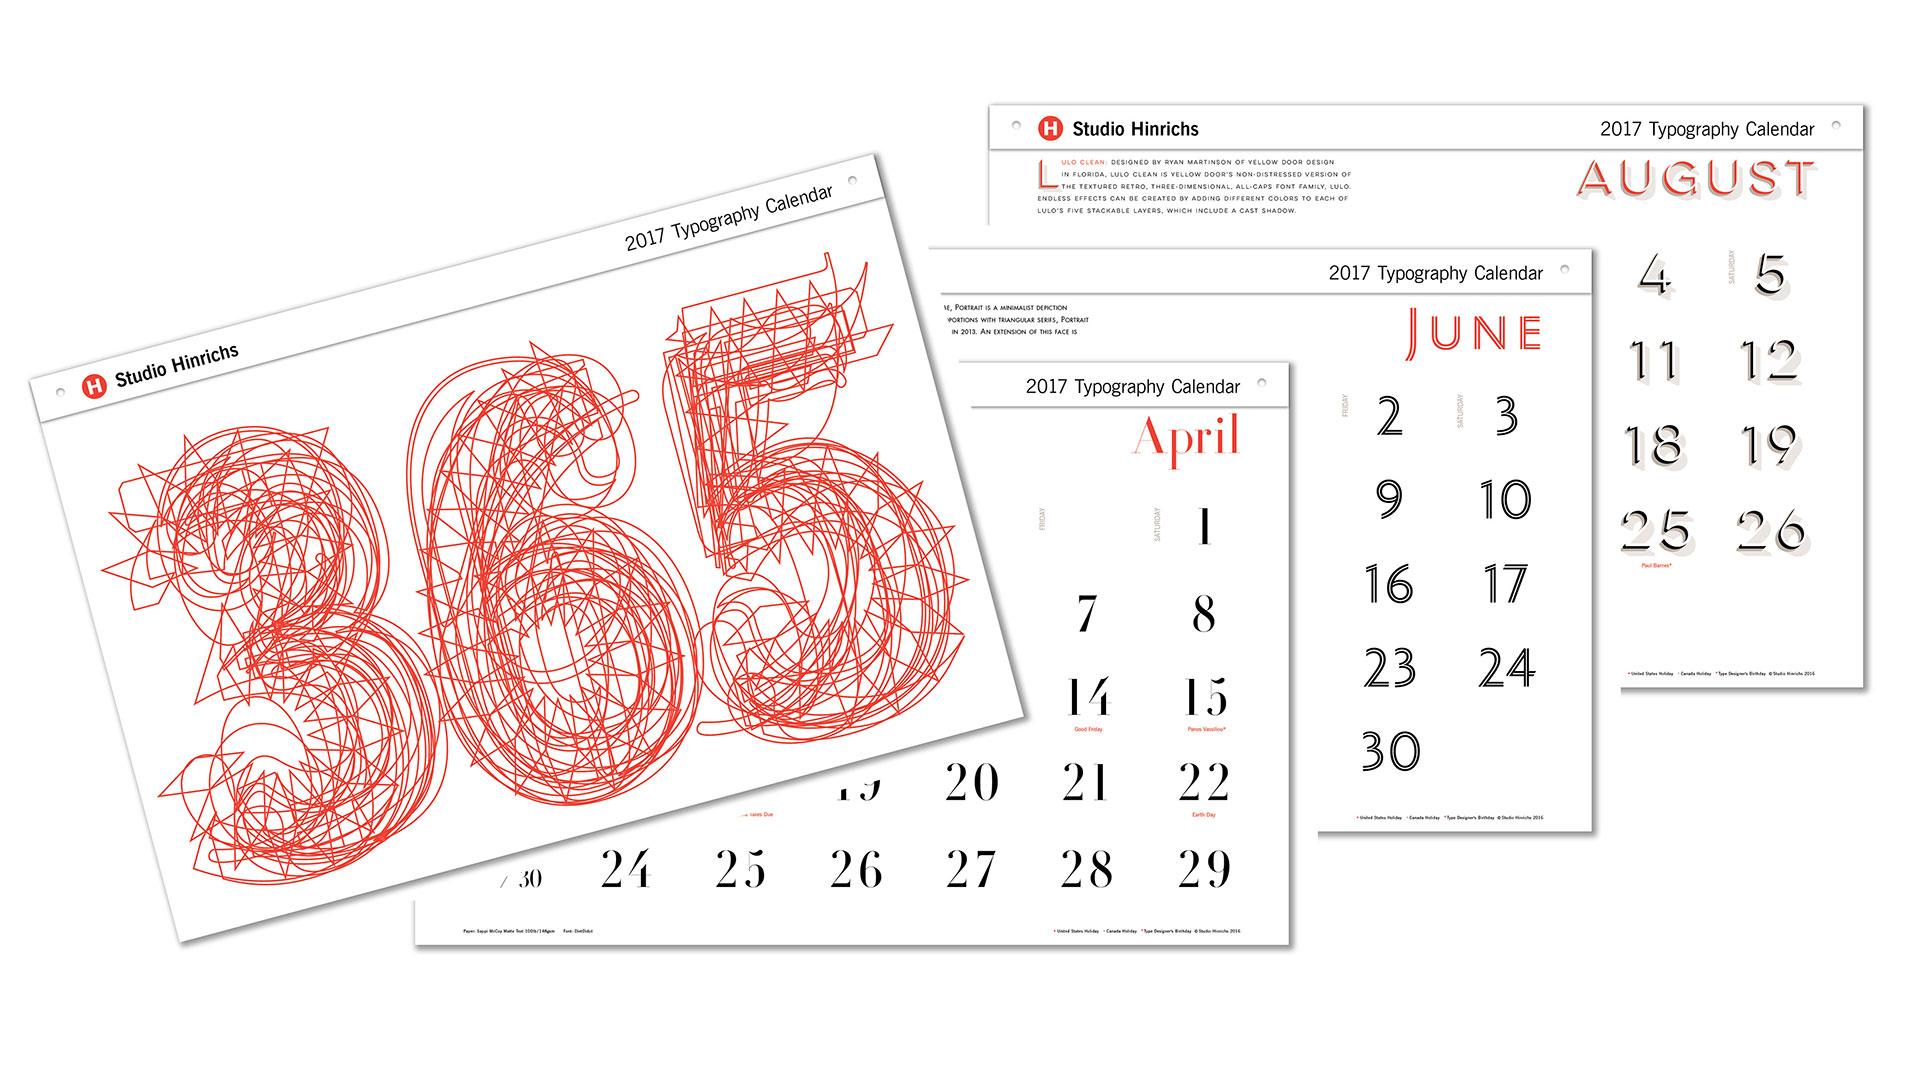 94-calendar-1